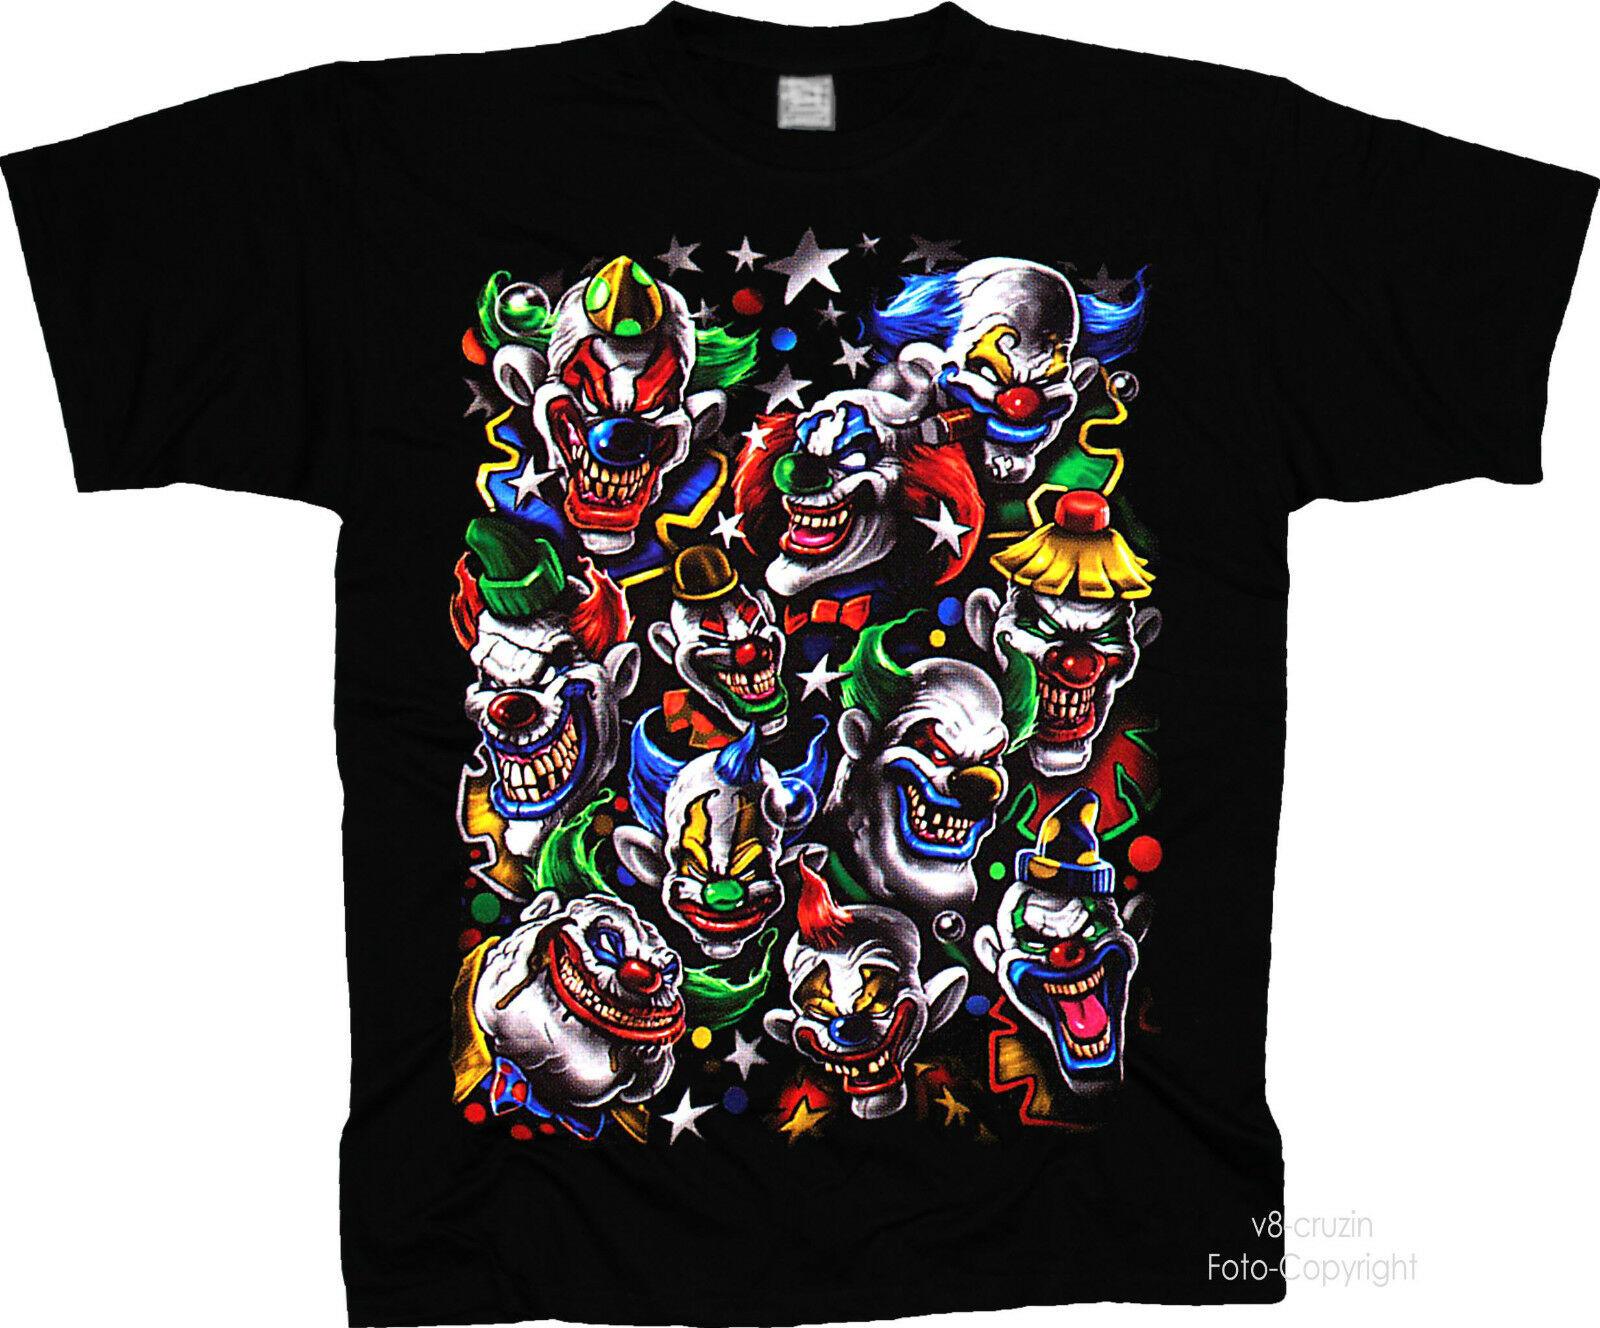 Halloween payaso circo harlequin actor de comedia fantasía Camiseta 4050-S-3XL hombres mujeres Unisex camiseta de moda envío gratis